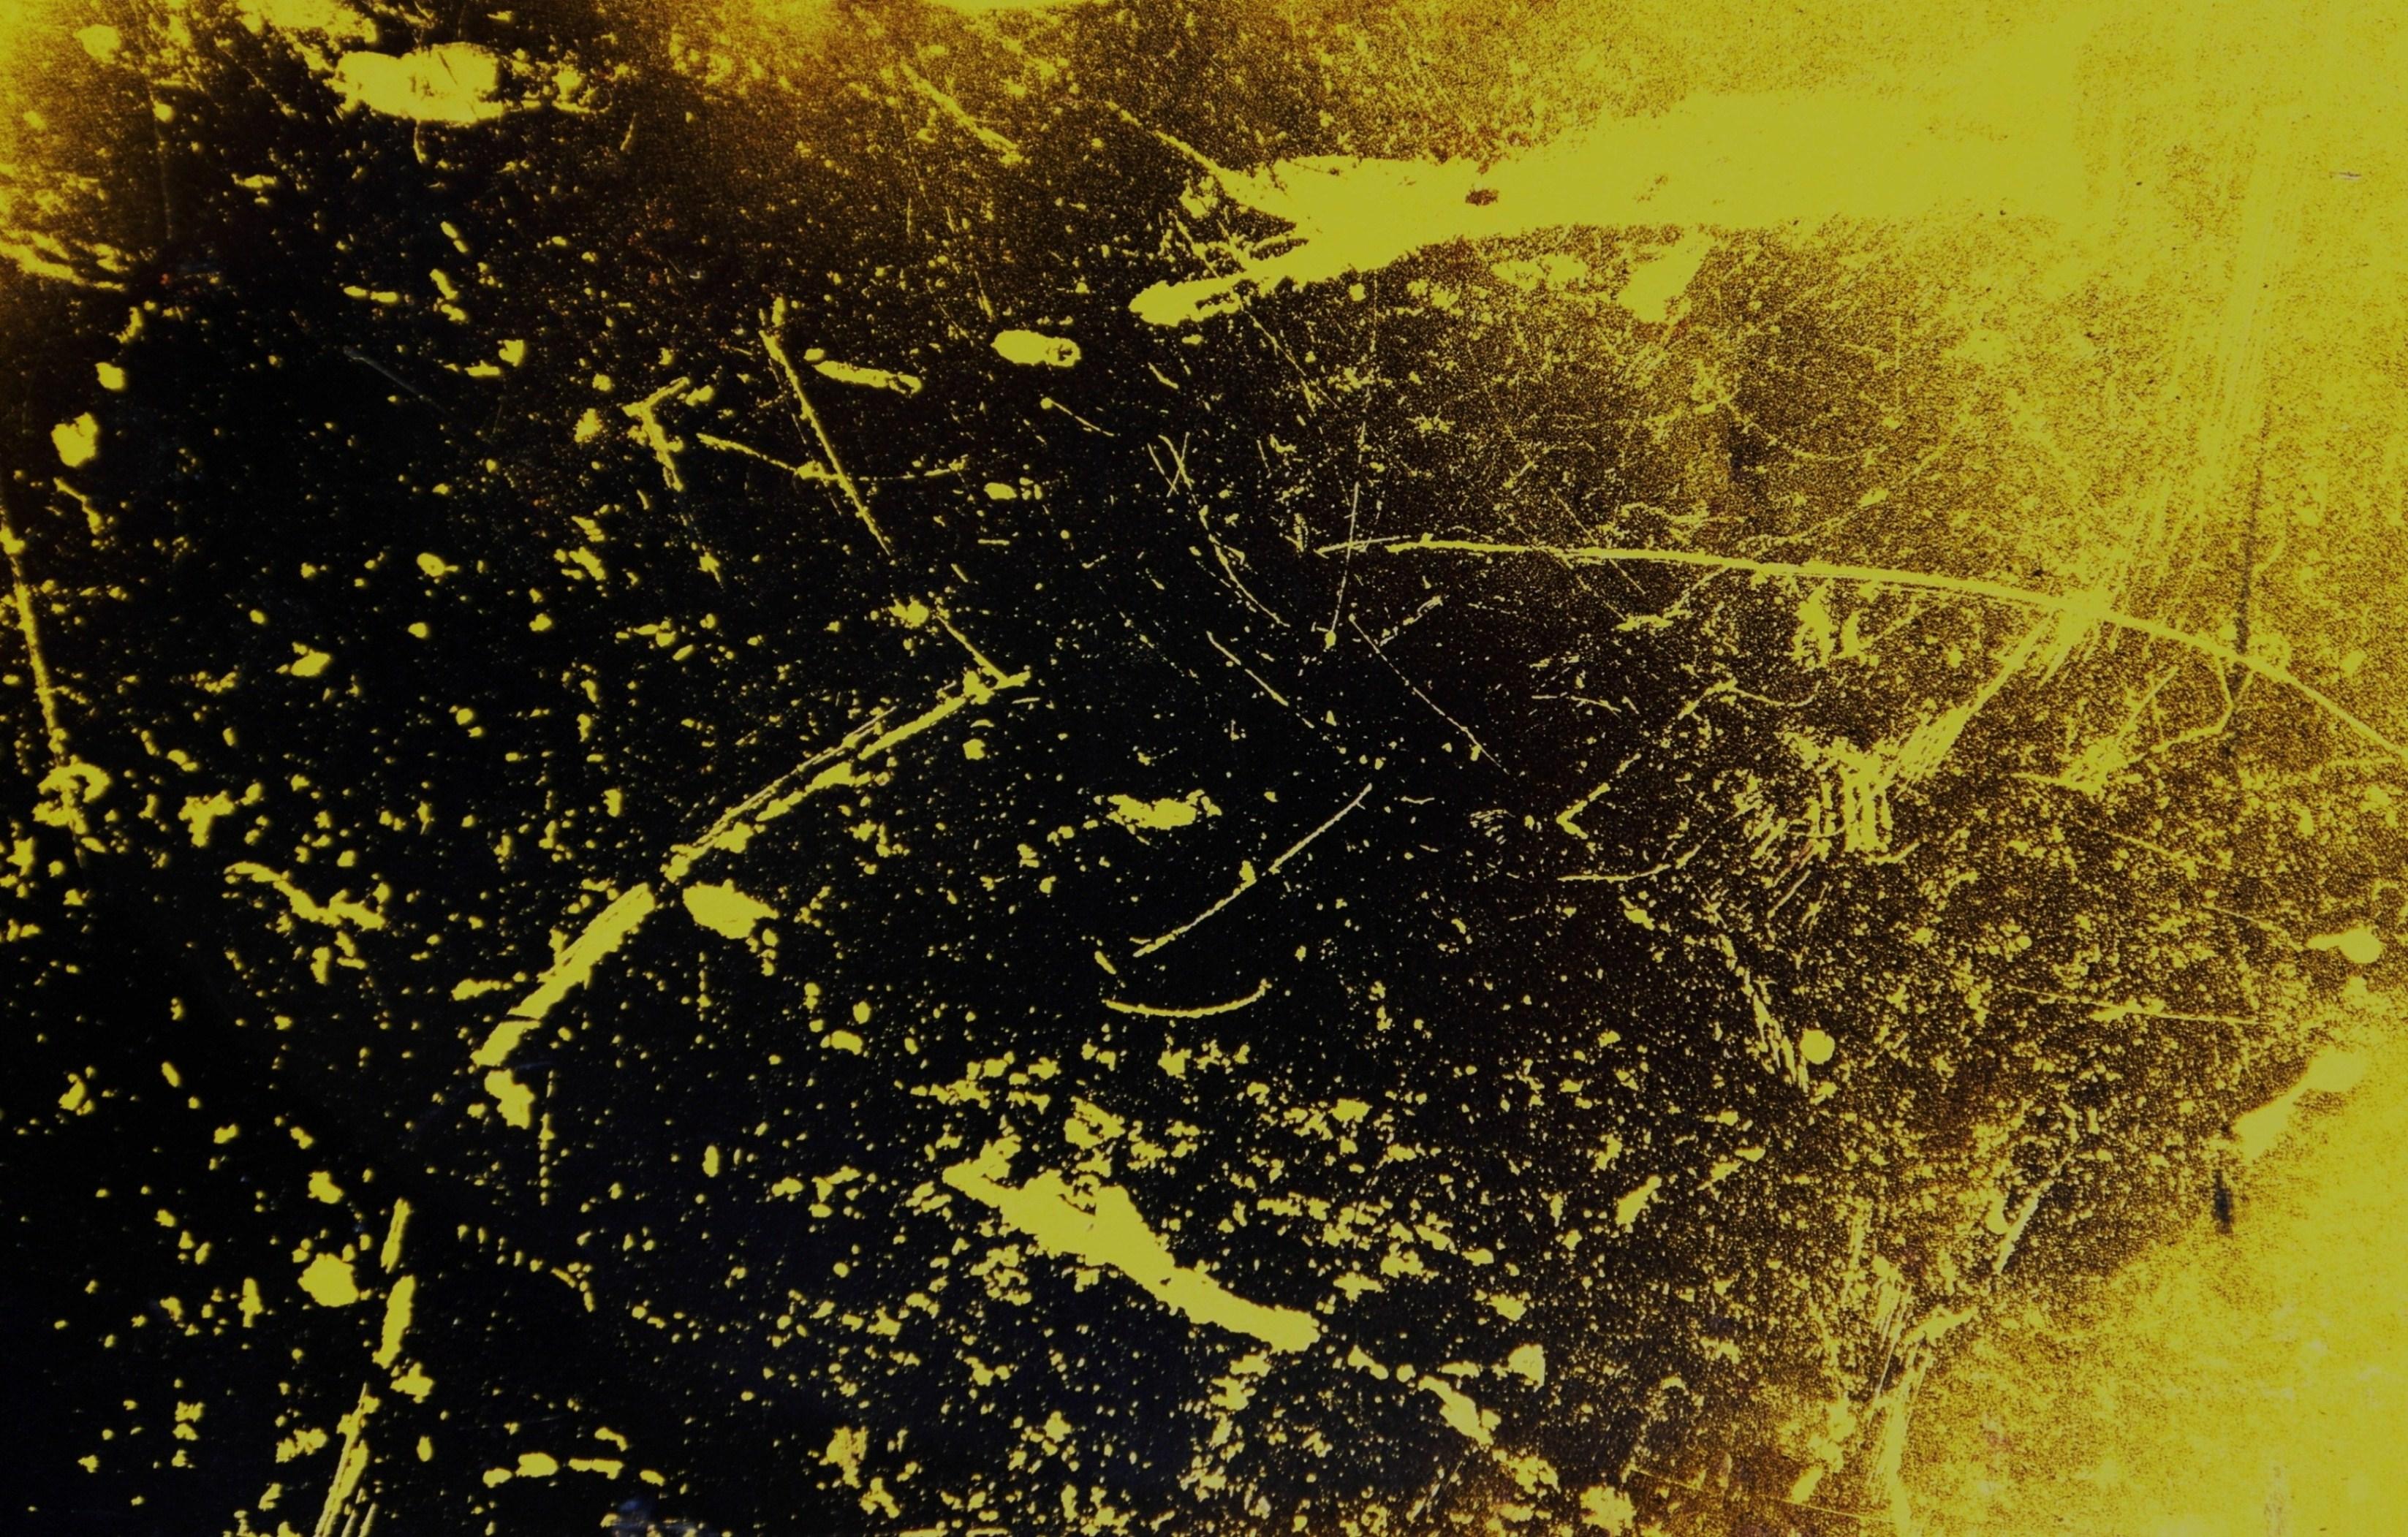 Dirty yellow grunge texture photo